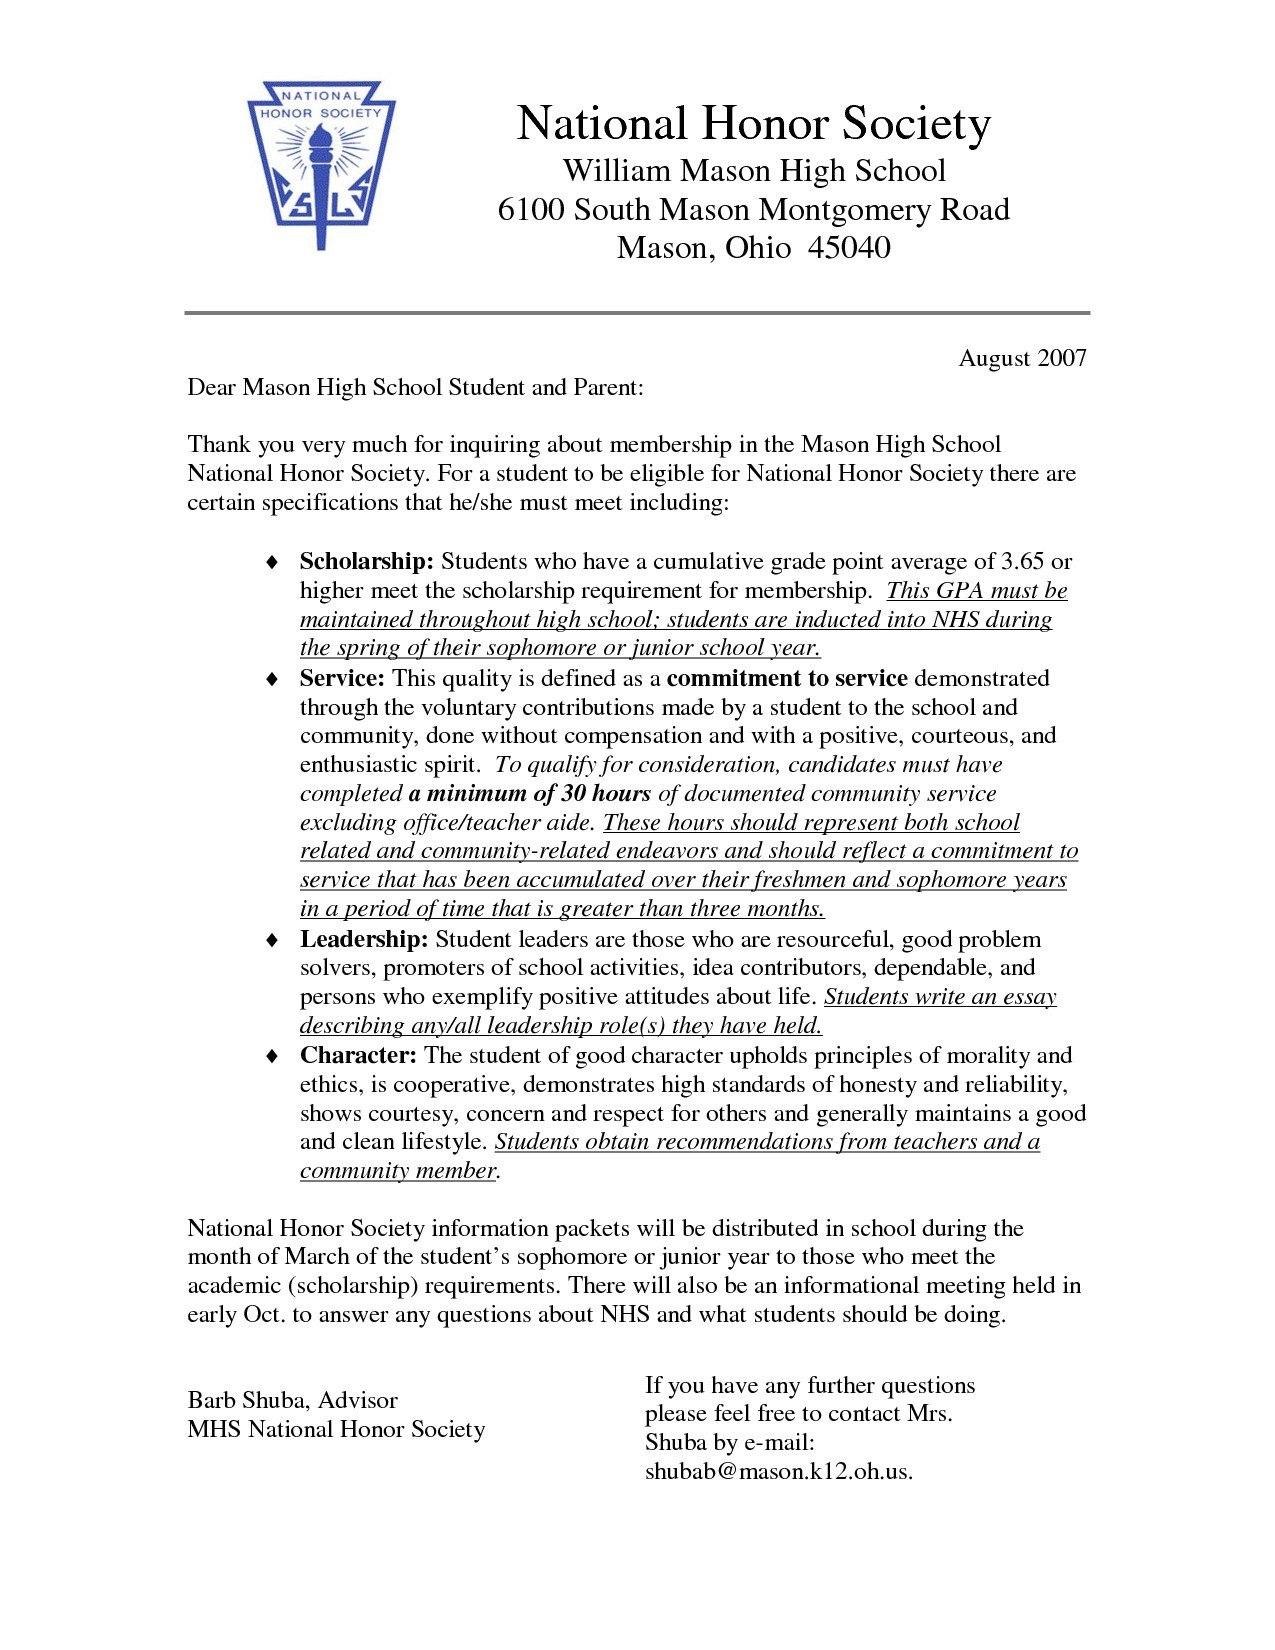 National Junior Honor Society Letter Of Recommendation Template For National Junior Honor Society Letter Of Recommendation Template